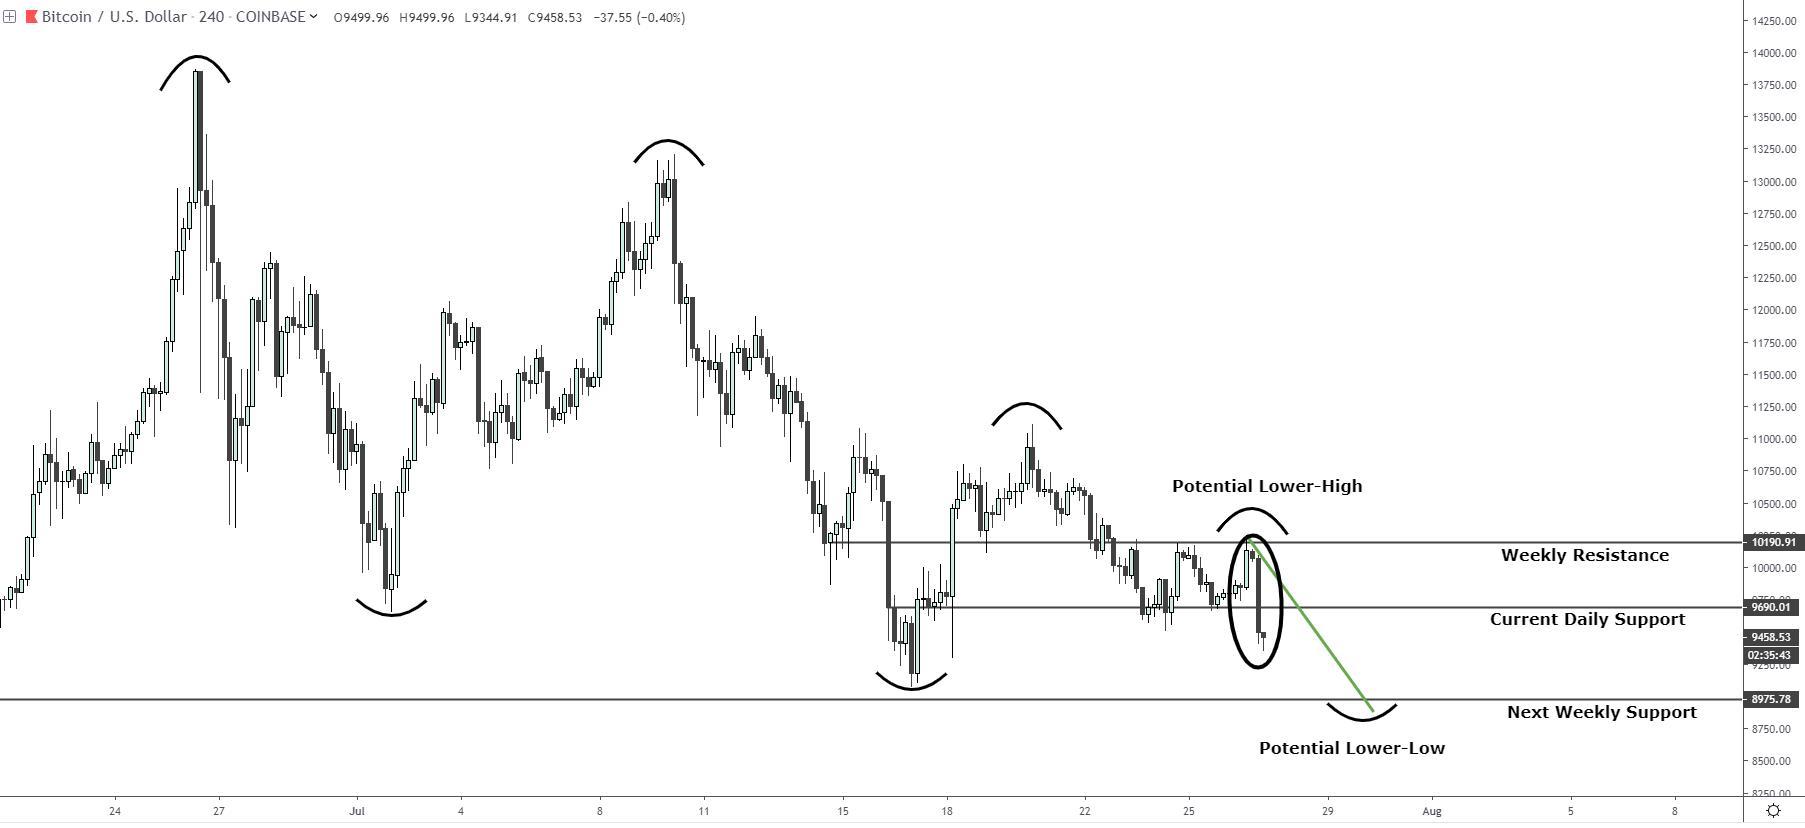 Alex Krüger: First Bitcoin Buy Zone Approaching – BTC, Ethereum, XRP, Litecoin, Bitcoin Cash Forecasts